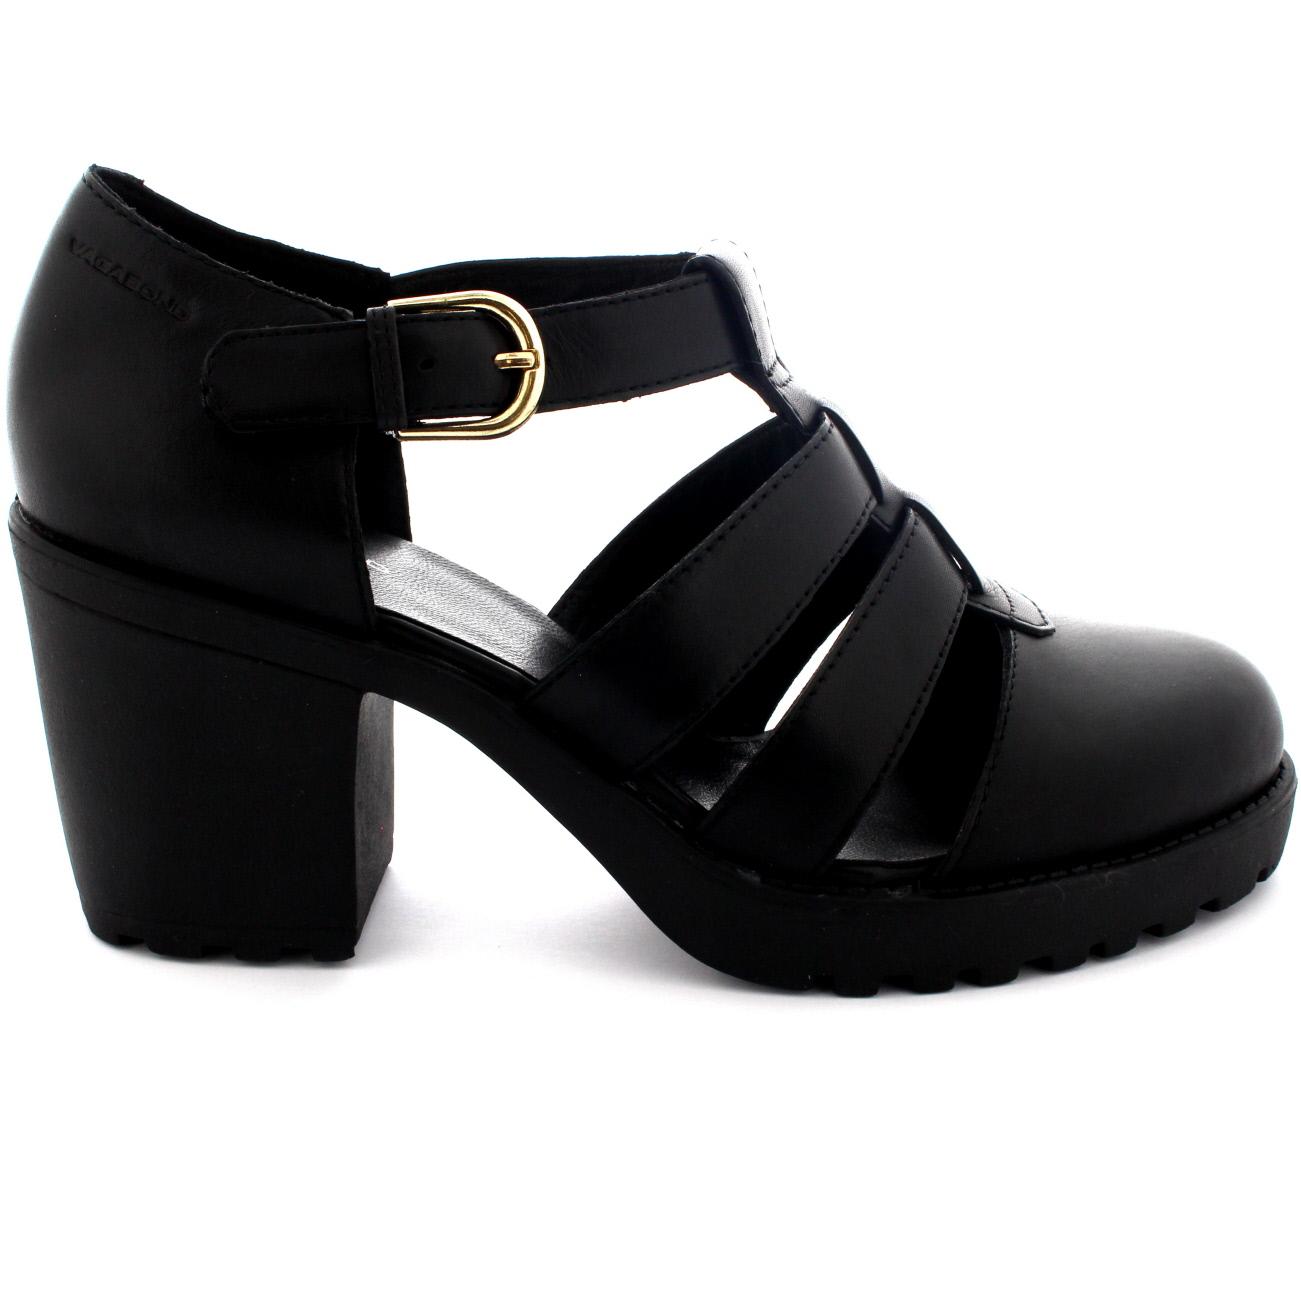 Black sandals mid heel uk - Womens Vagabond Grace Buckle Leather Festival Mid Heel Boots Sandals Uk 3 5 8